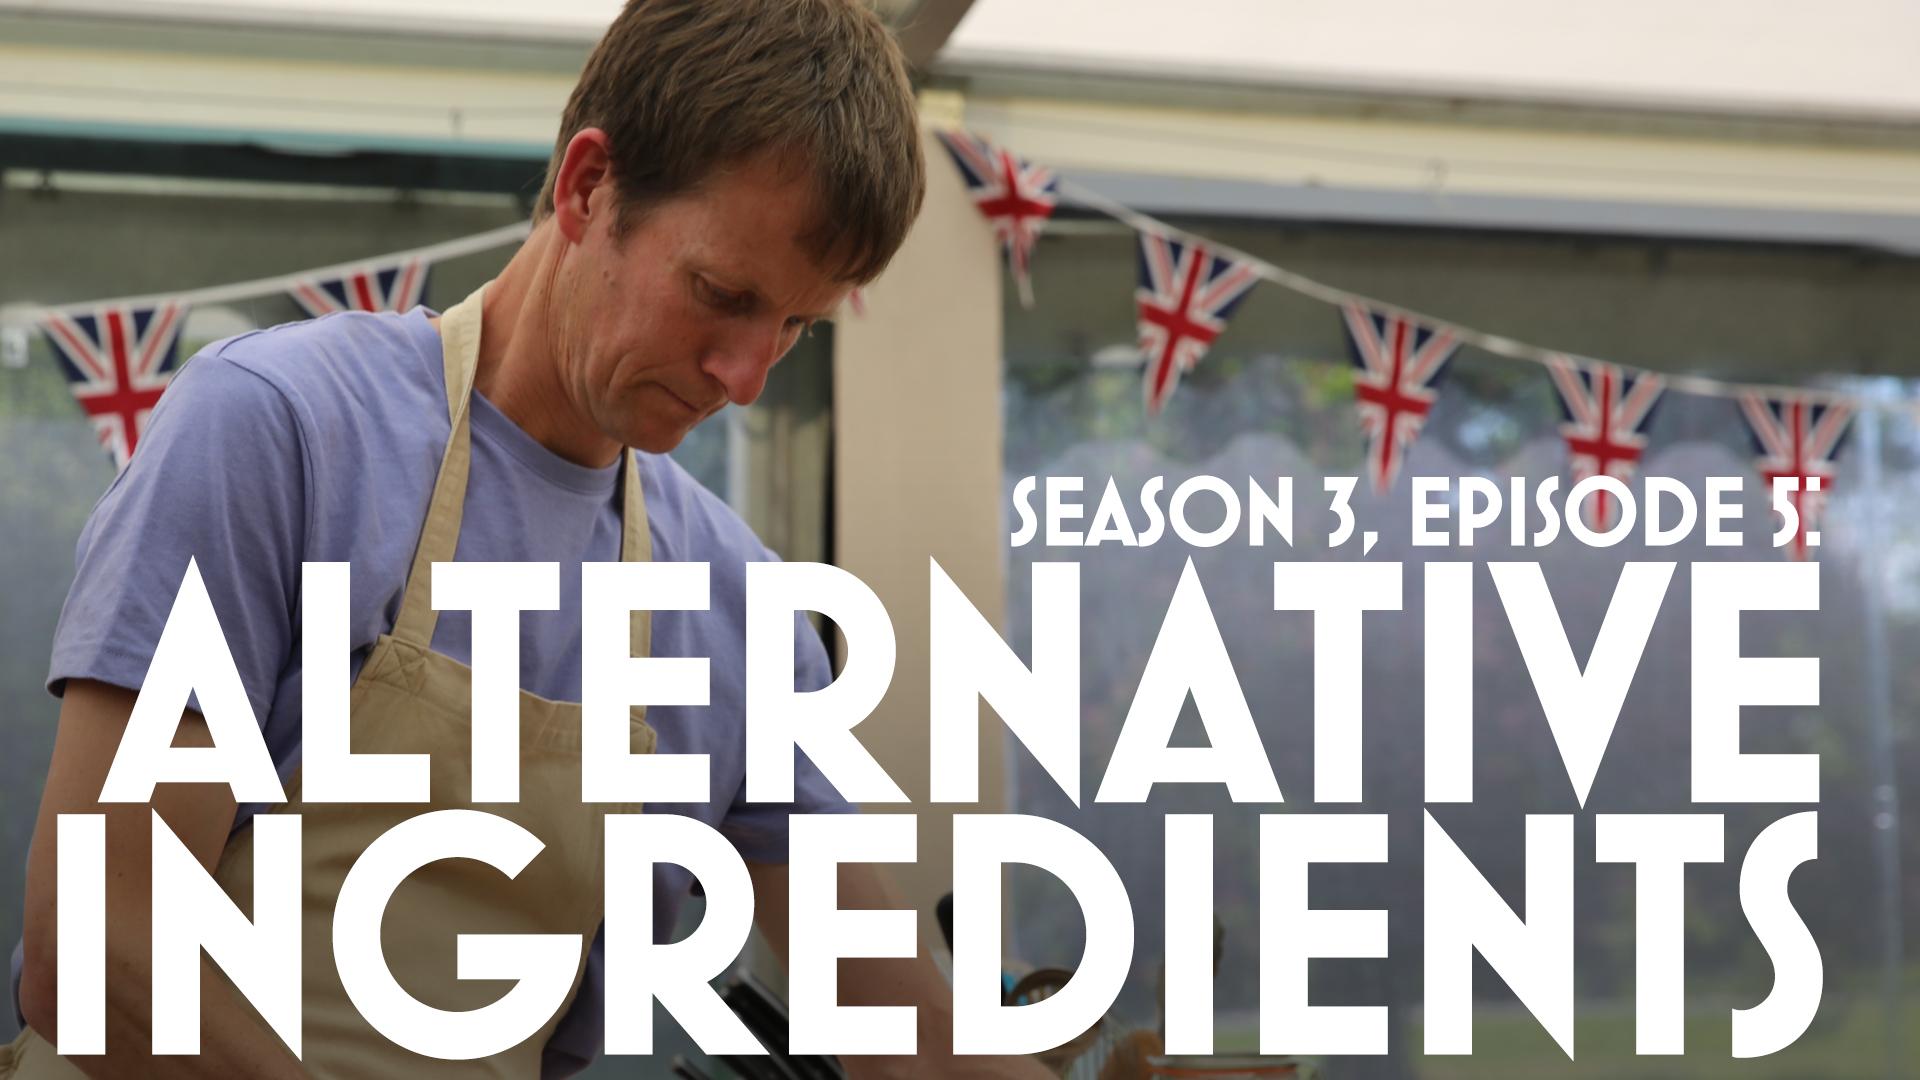 Episode 5: Alternative Ingredients